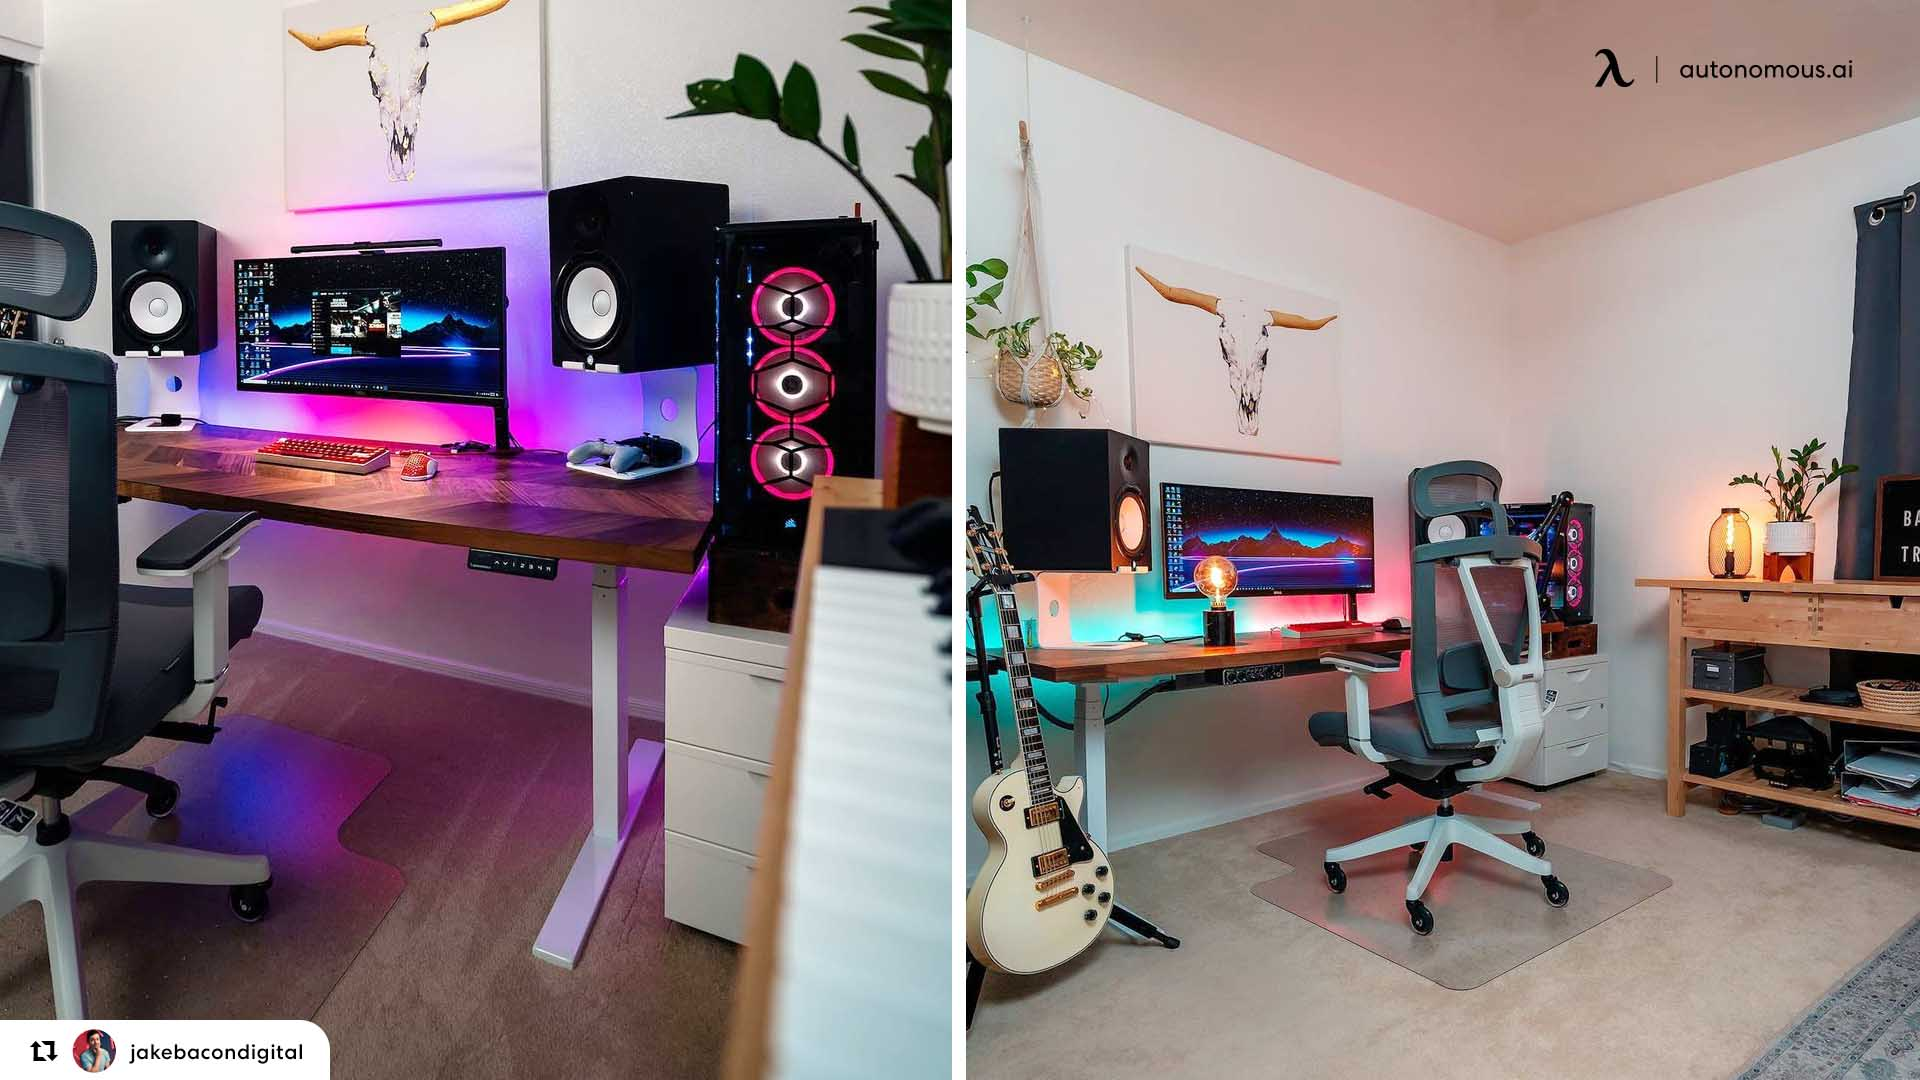 SmartDesk 2 – Home Office